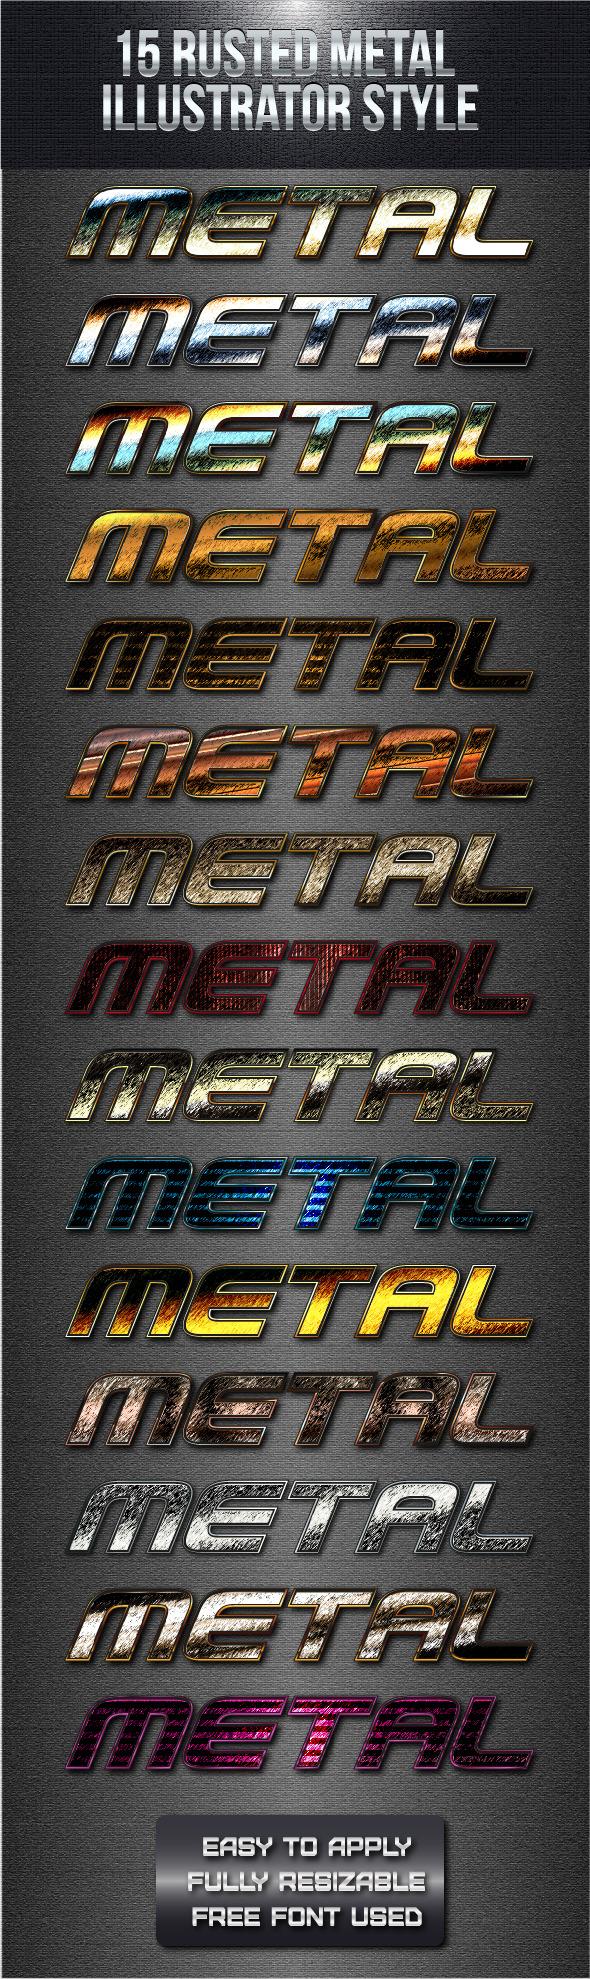 15 Rusted Metal Illustrator Style - Styles Illustrator